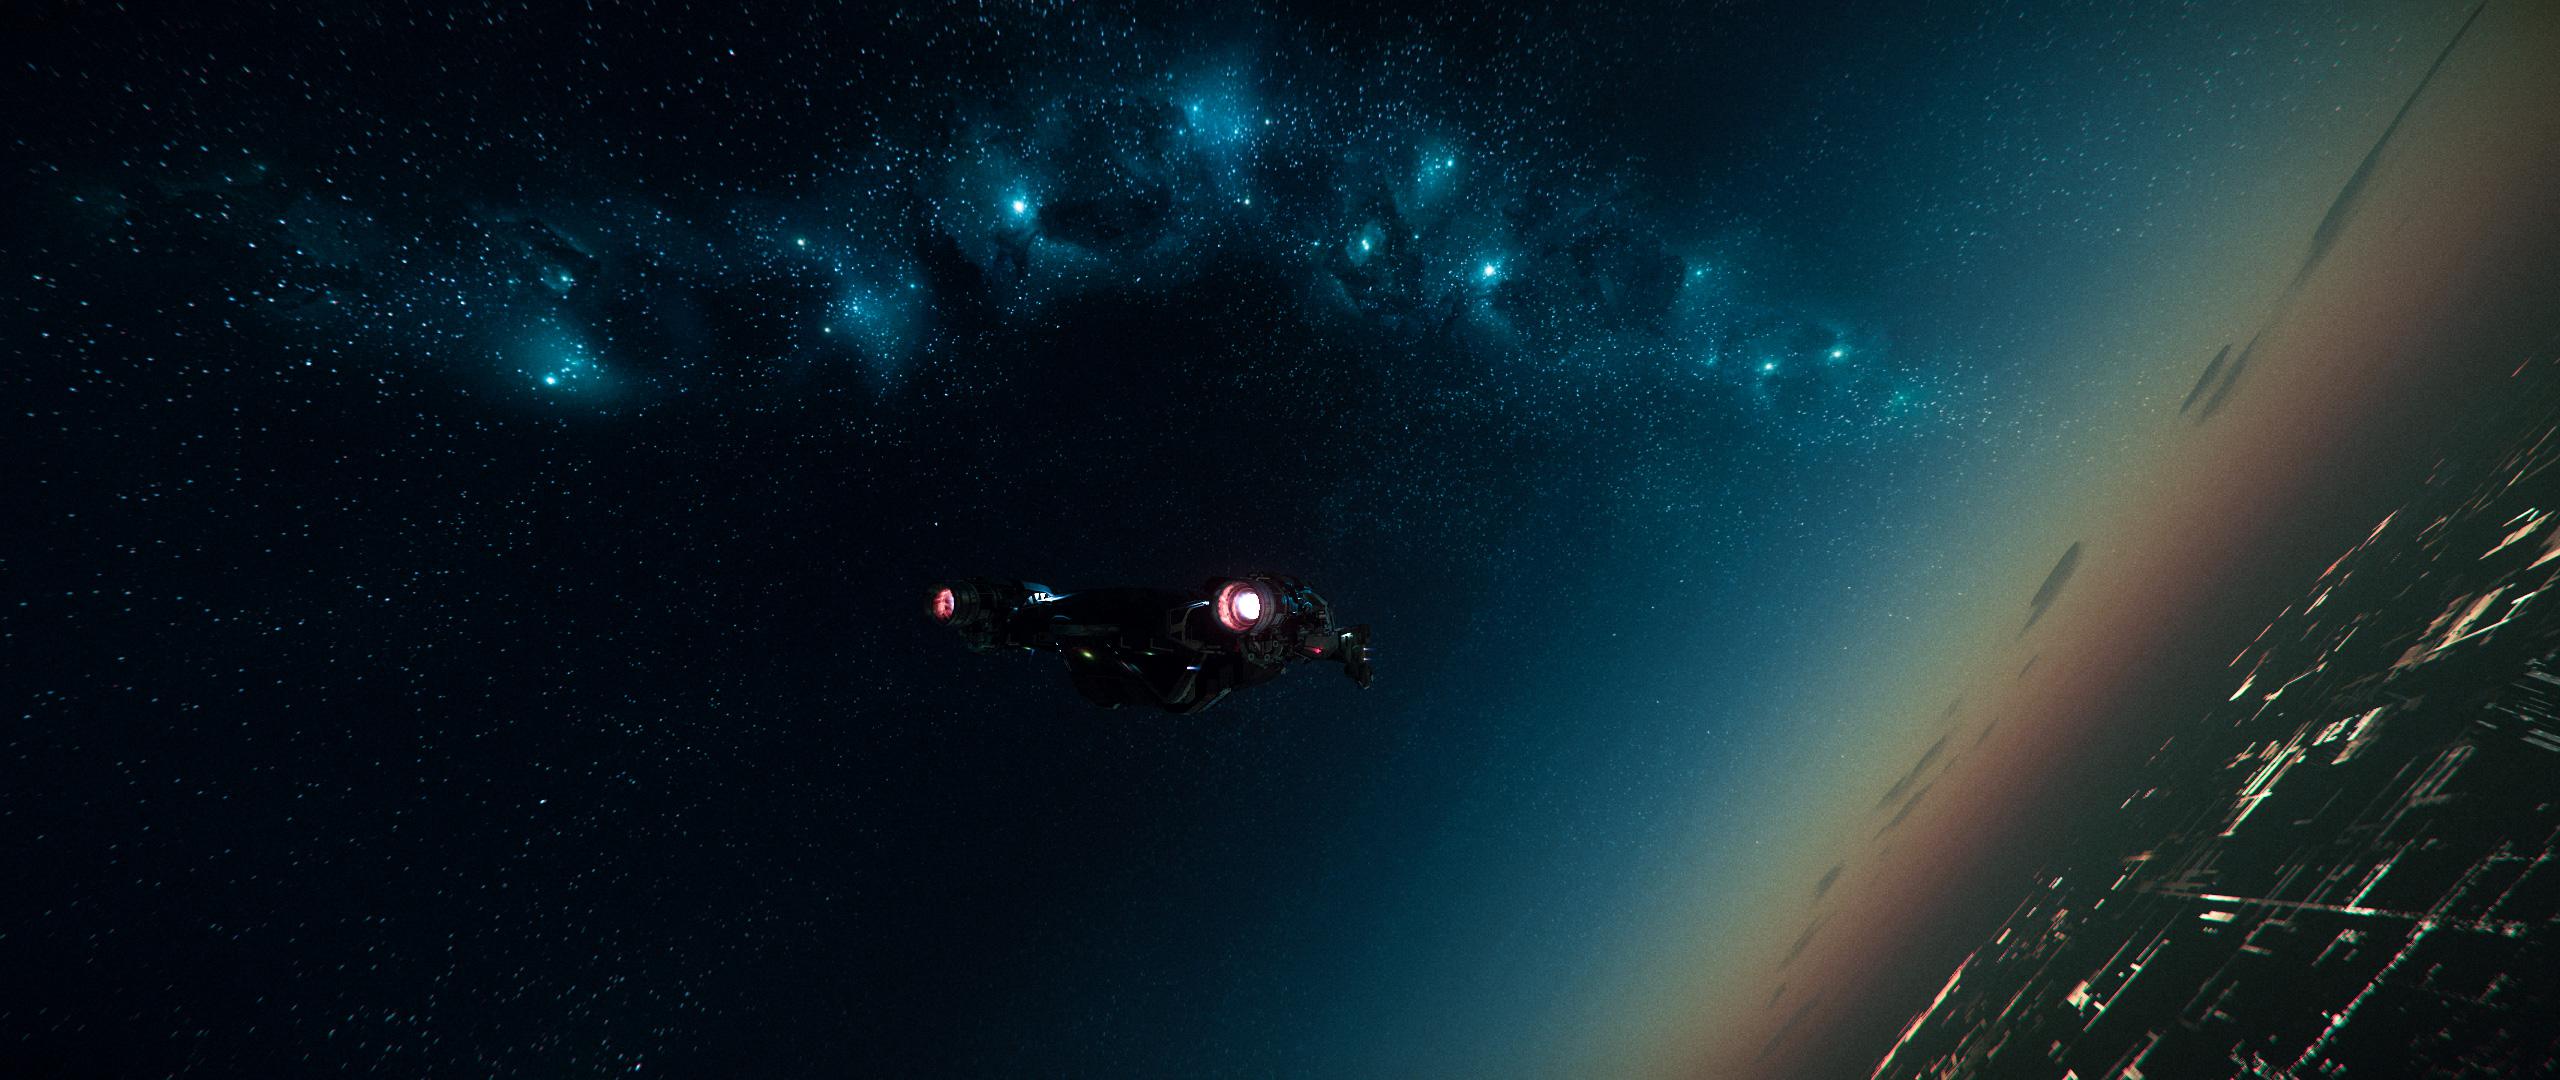 Wallpaper Star Citizen Ultrawide Ultra Settings Screen Shot Space Planet Spaceship 2560x1080 Blendking 1698513 Hd Wallpapers Wallhere